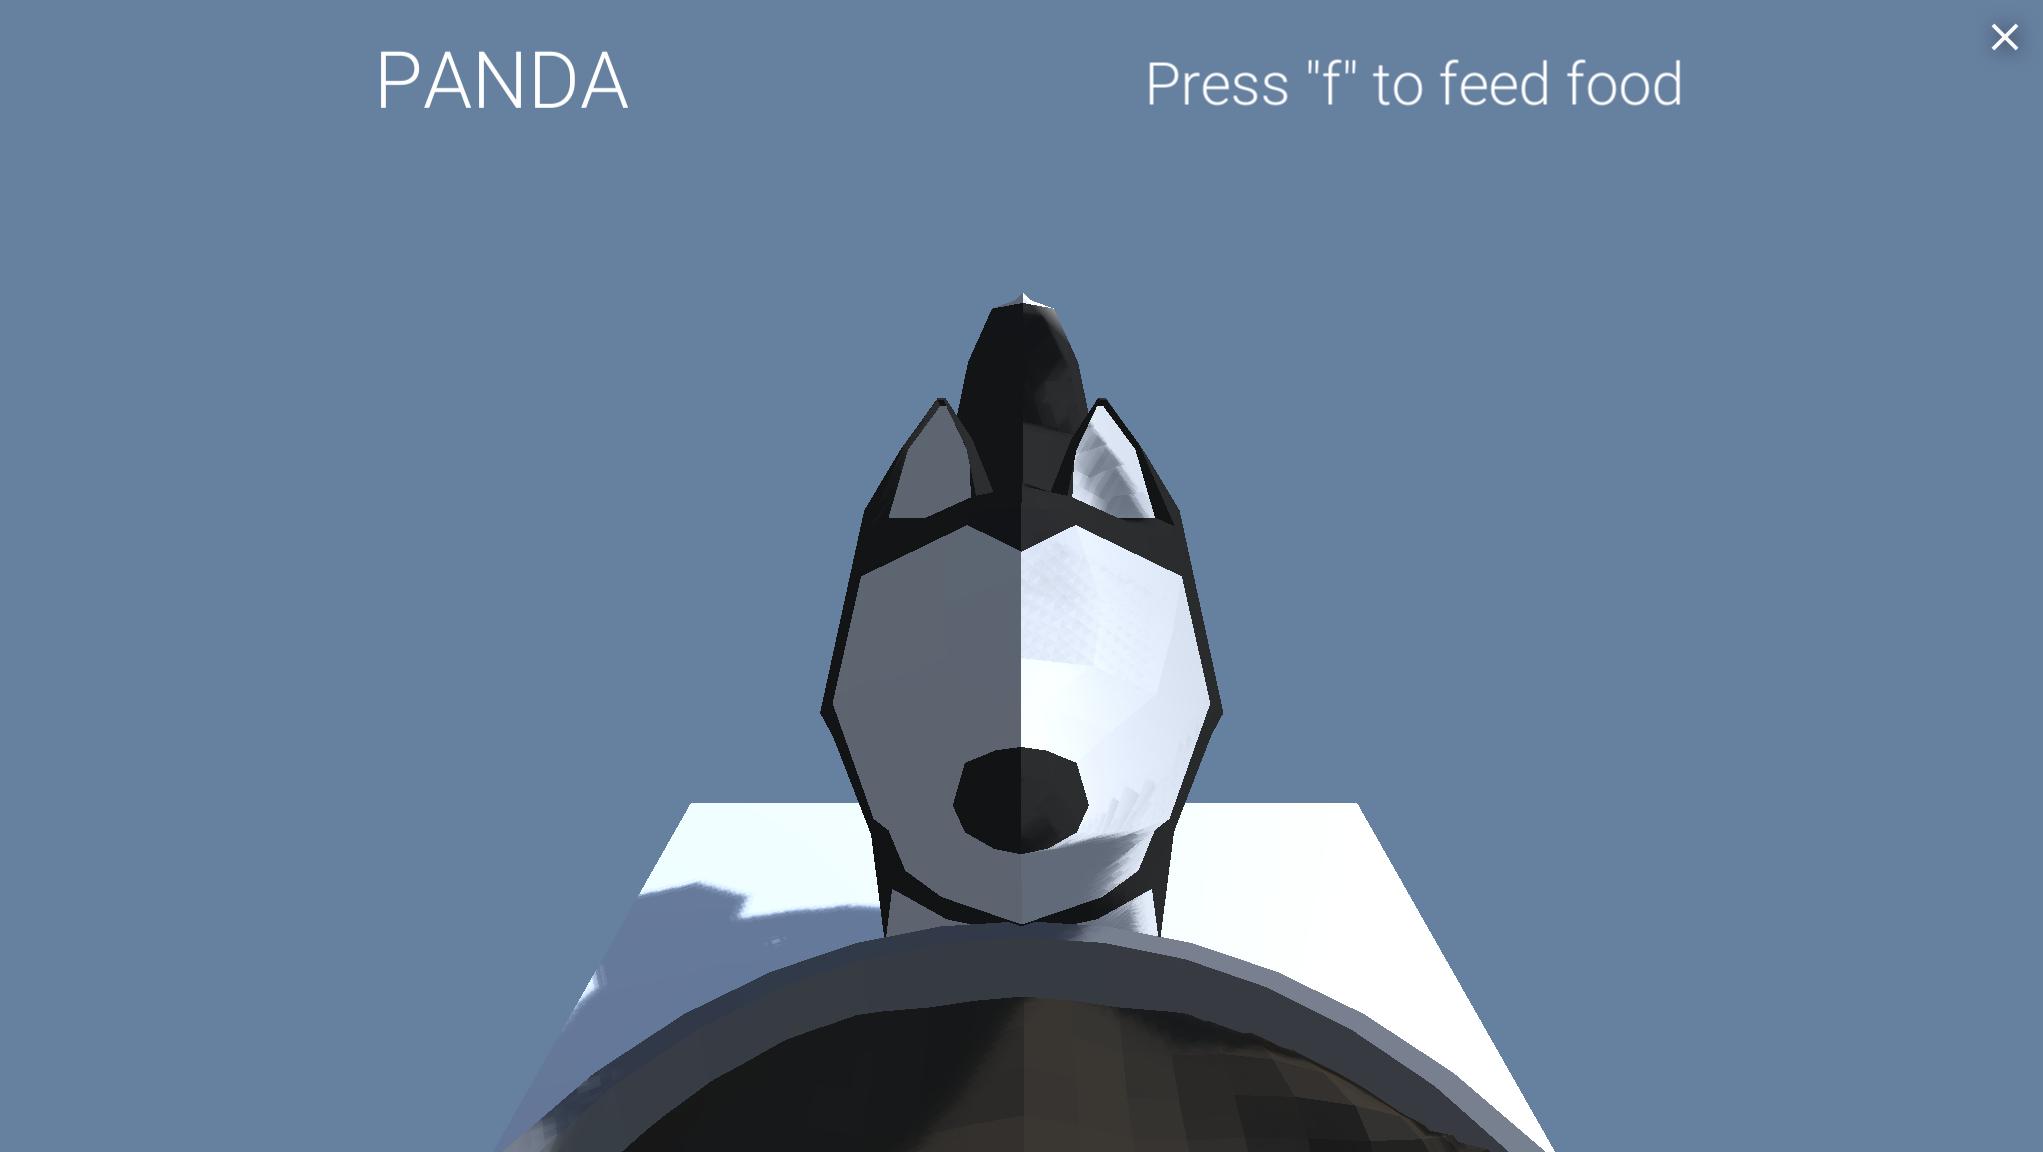 Thumbnail of the app